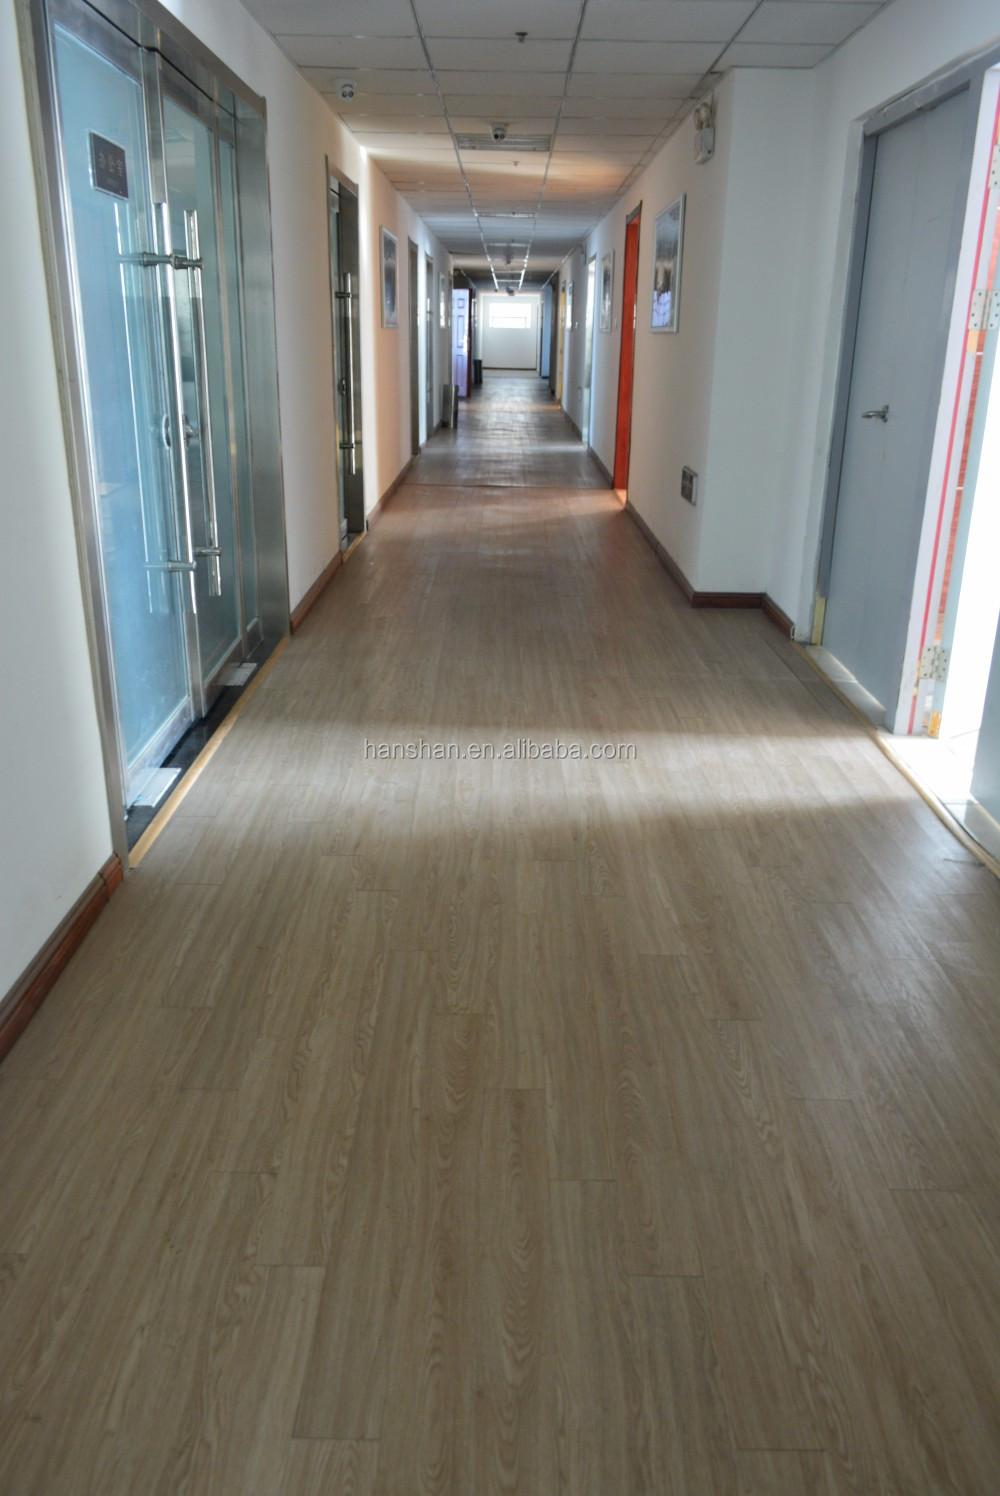 Exterior Floor Covering Luxury Lvt Vinyl Plank Flooring